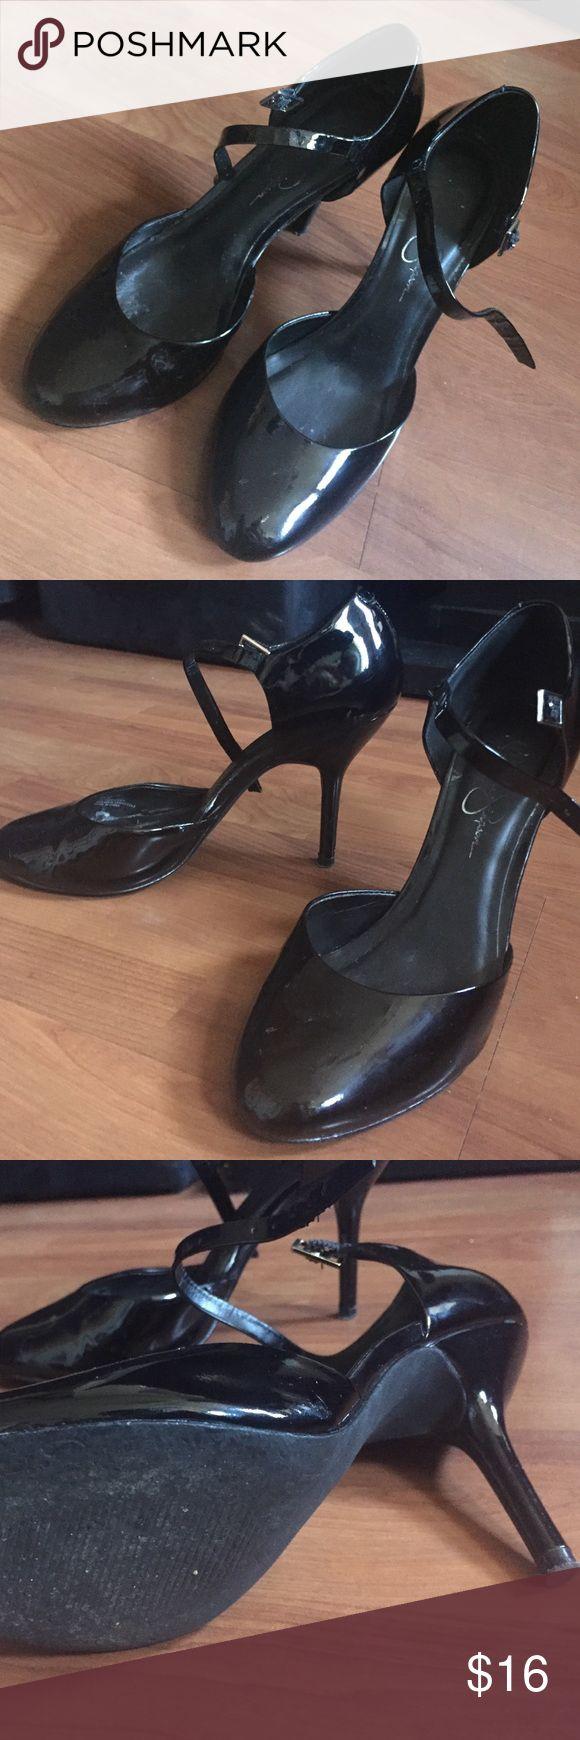 Black patent Jessica Simpson heels Black patent Jessica Simpson heels, with a strap, comfortable, good condition Jessica Simpson Shoes Heels